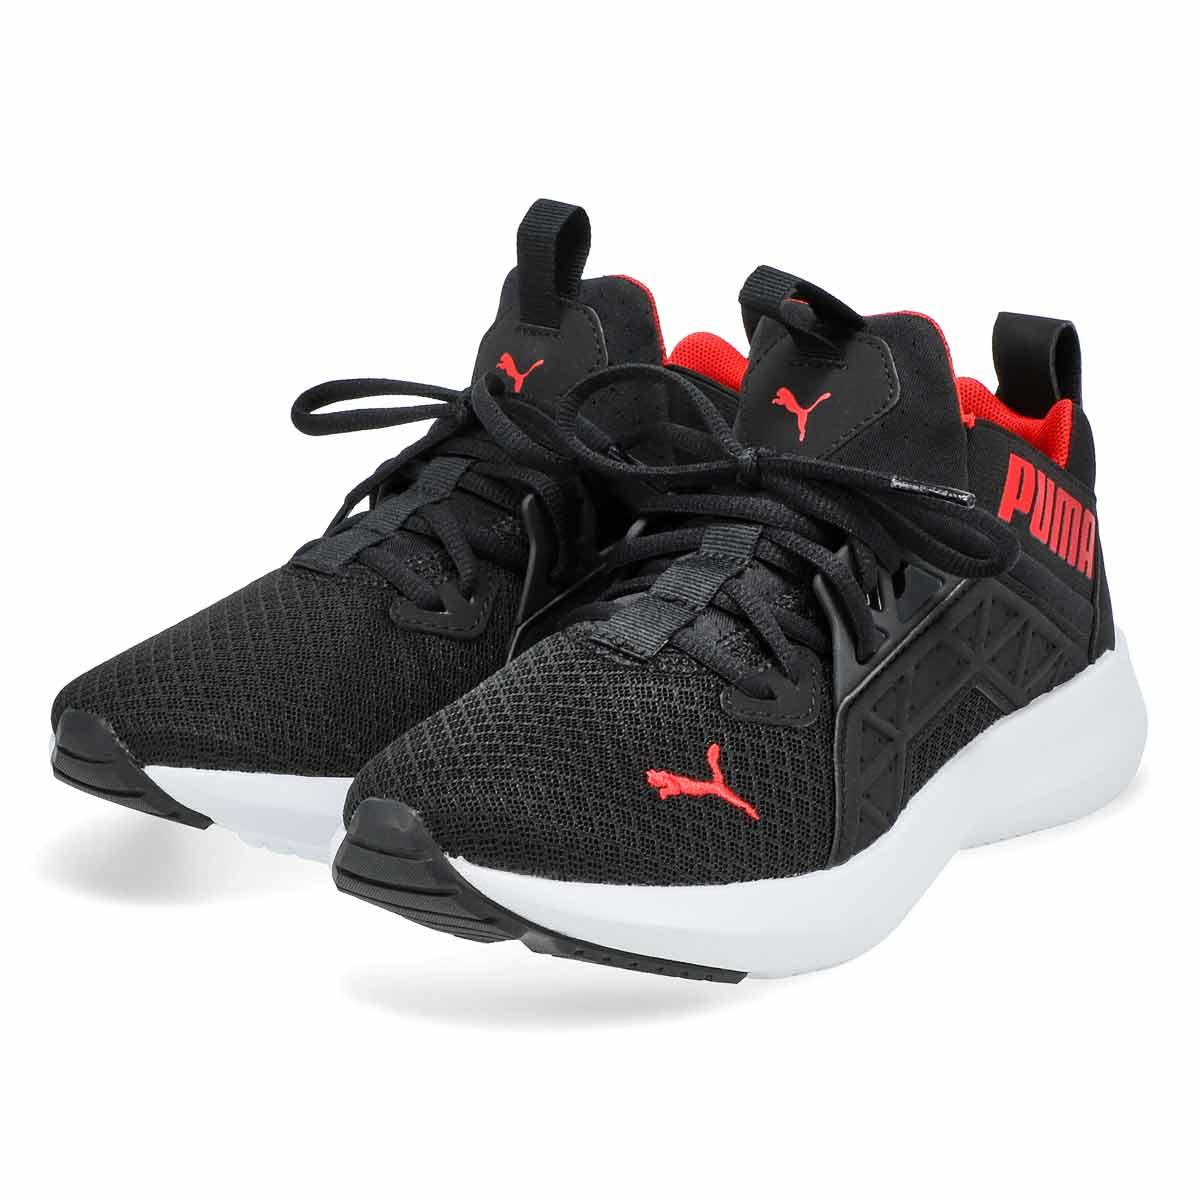 Boys' Softride Enzo NXT Jr Sneaker-Black/White/Red